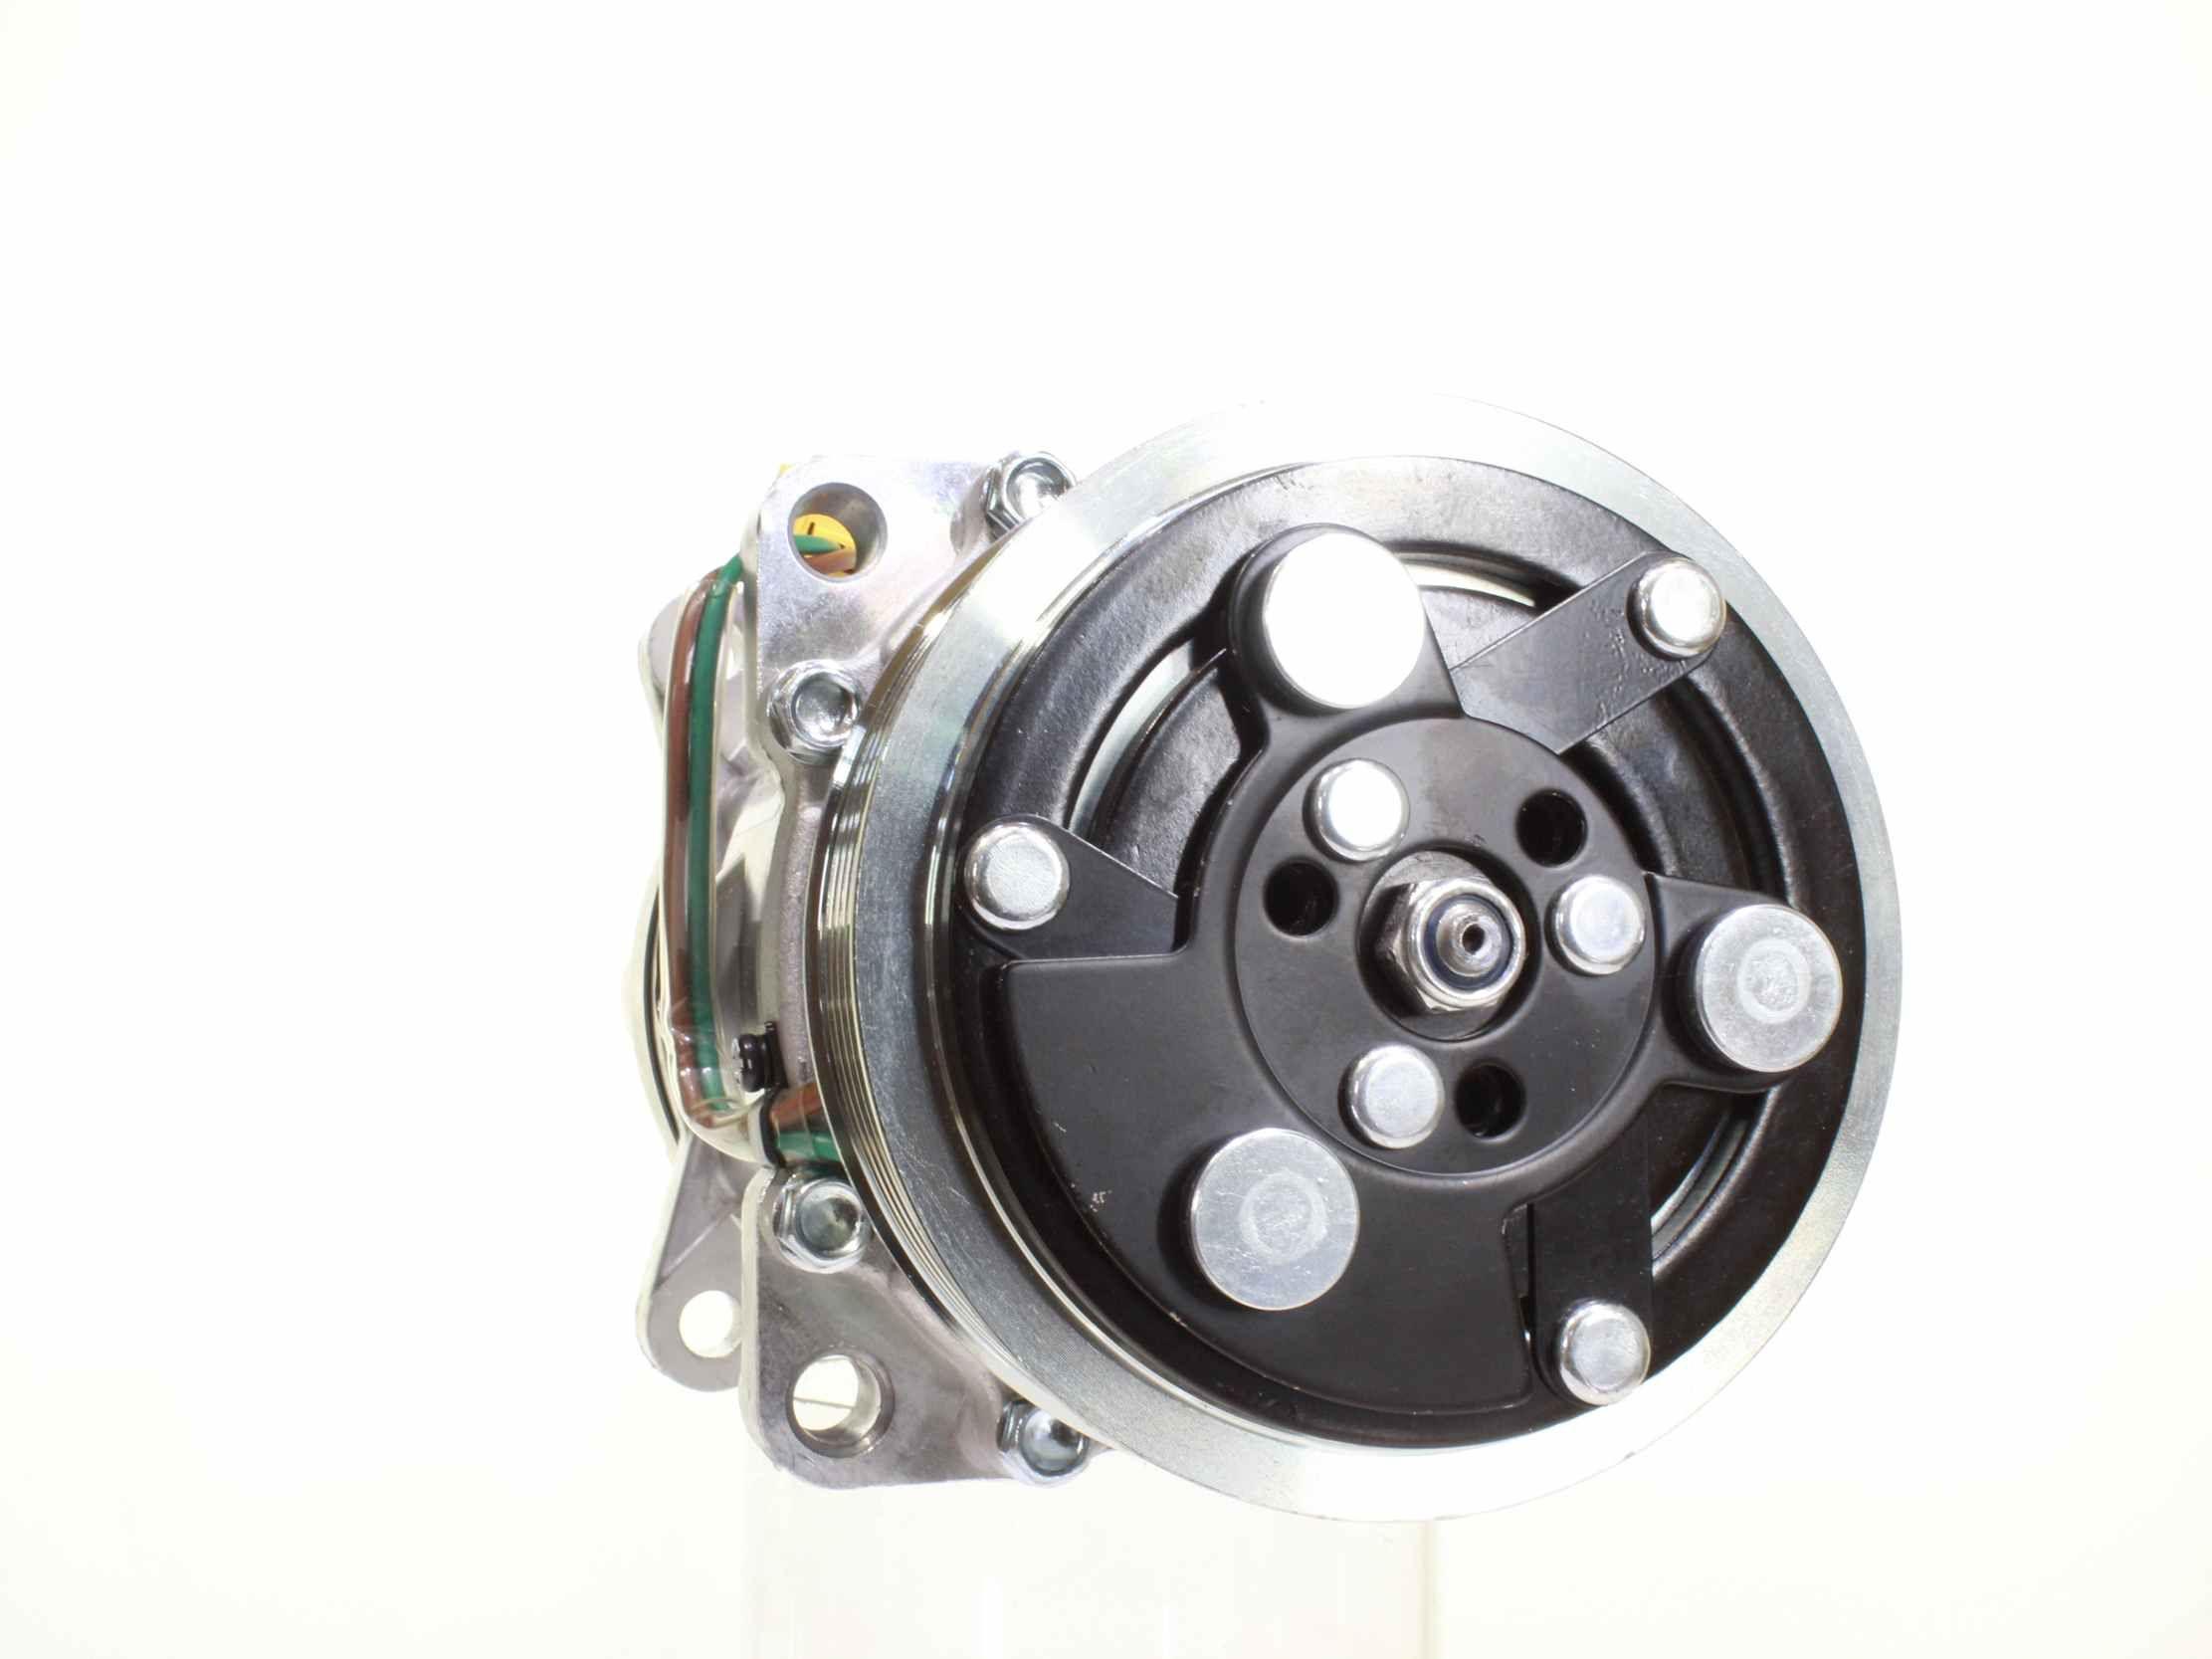 10550401 Klimaanlage Kompressor ALANKO - Markenprodukte billig